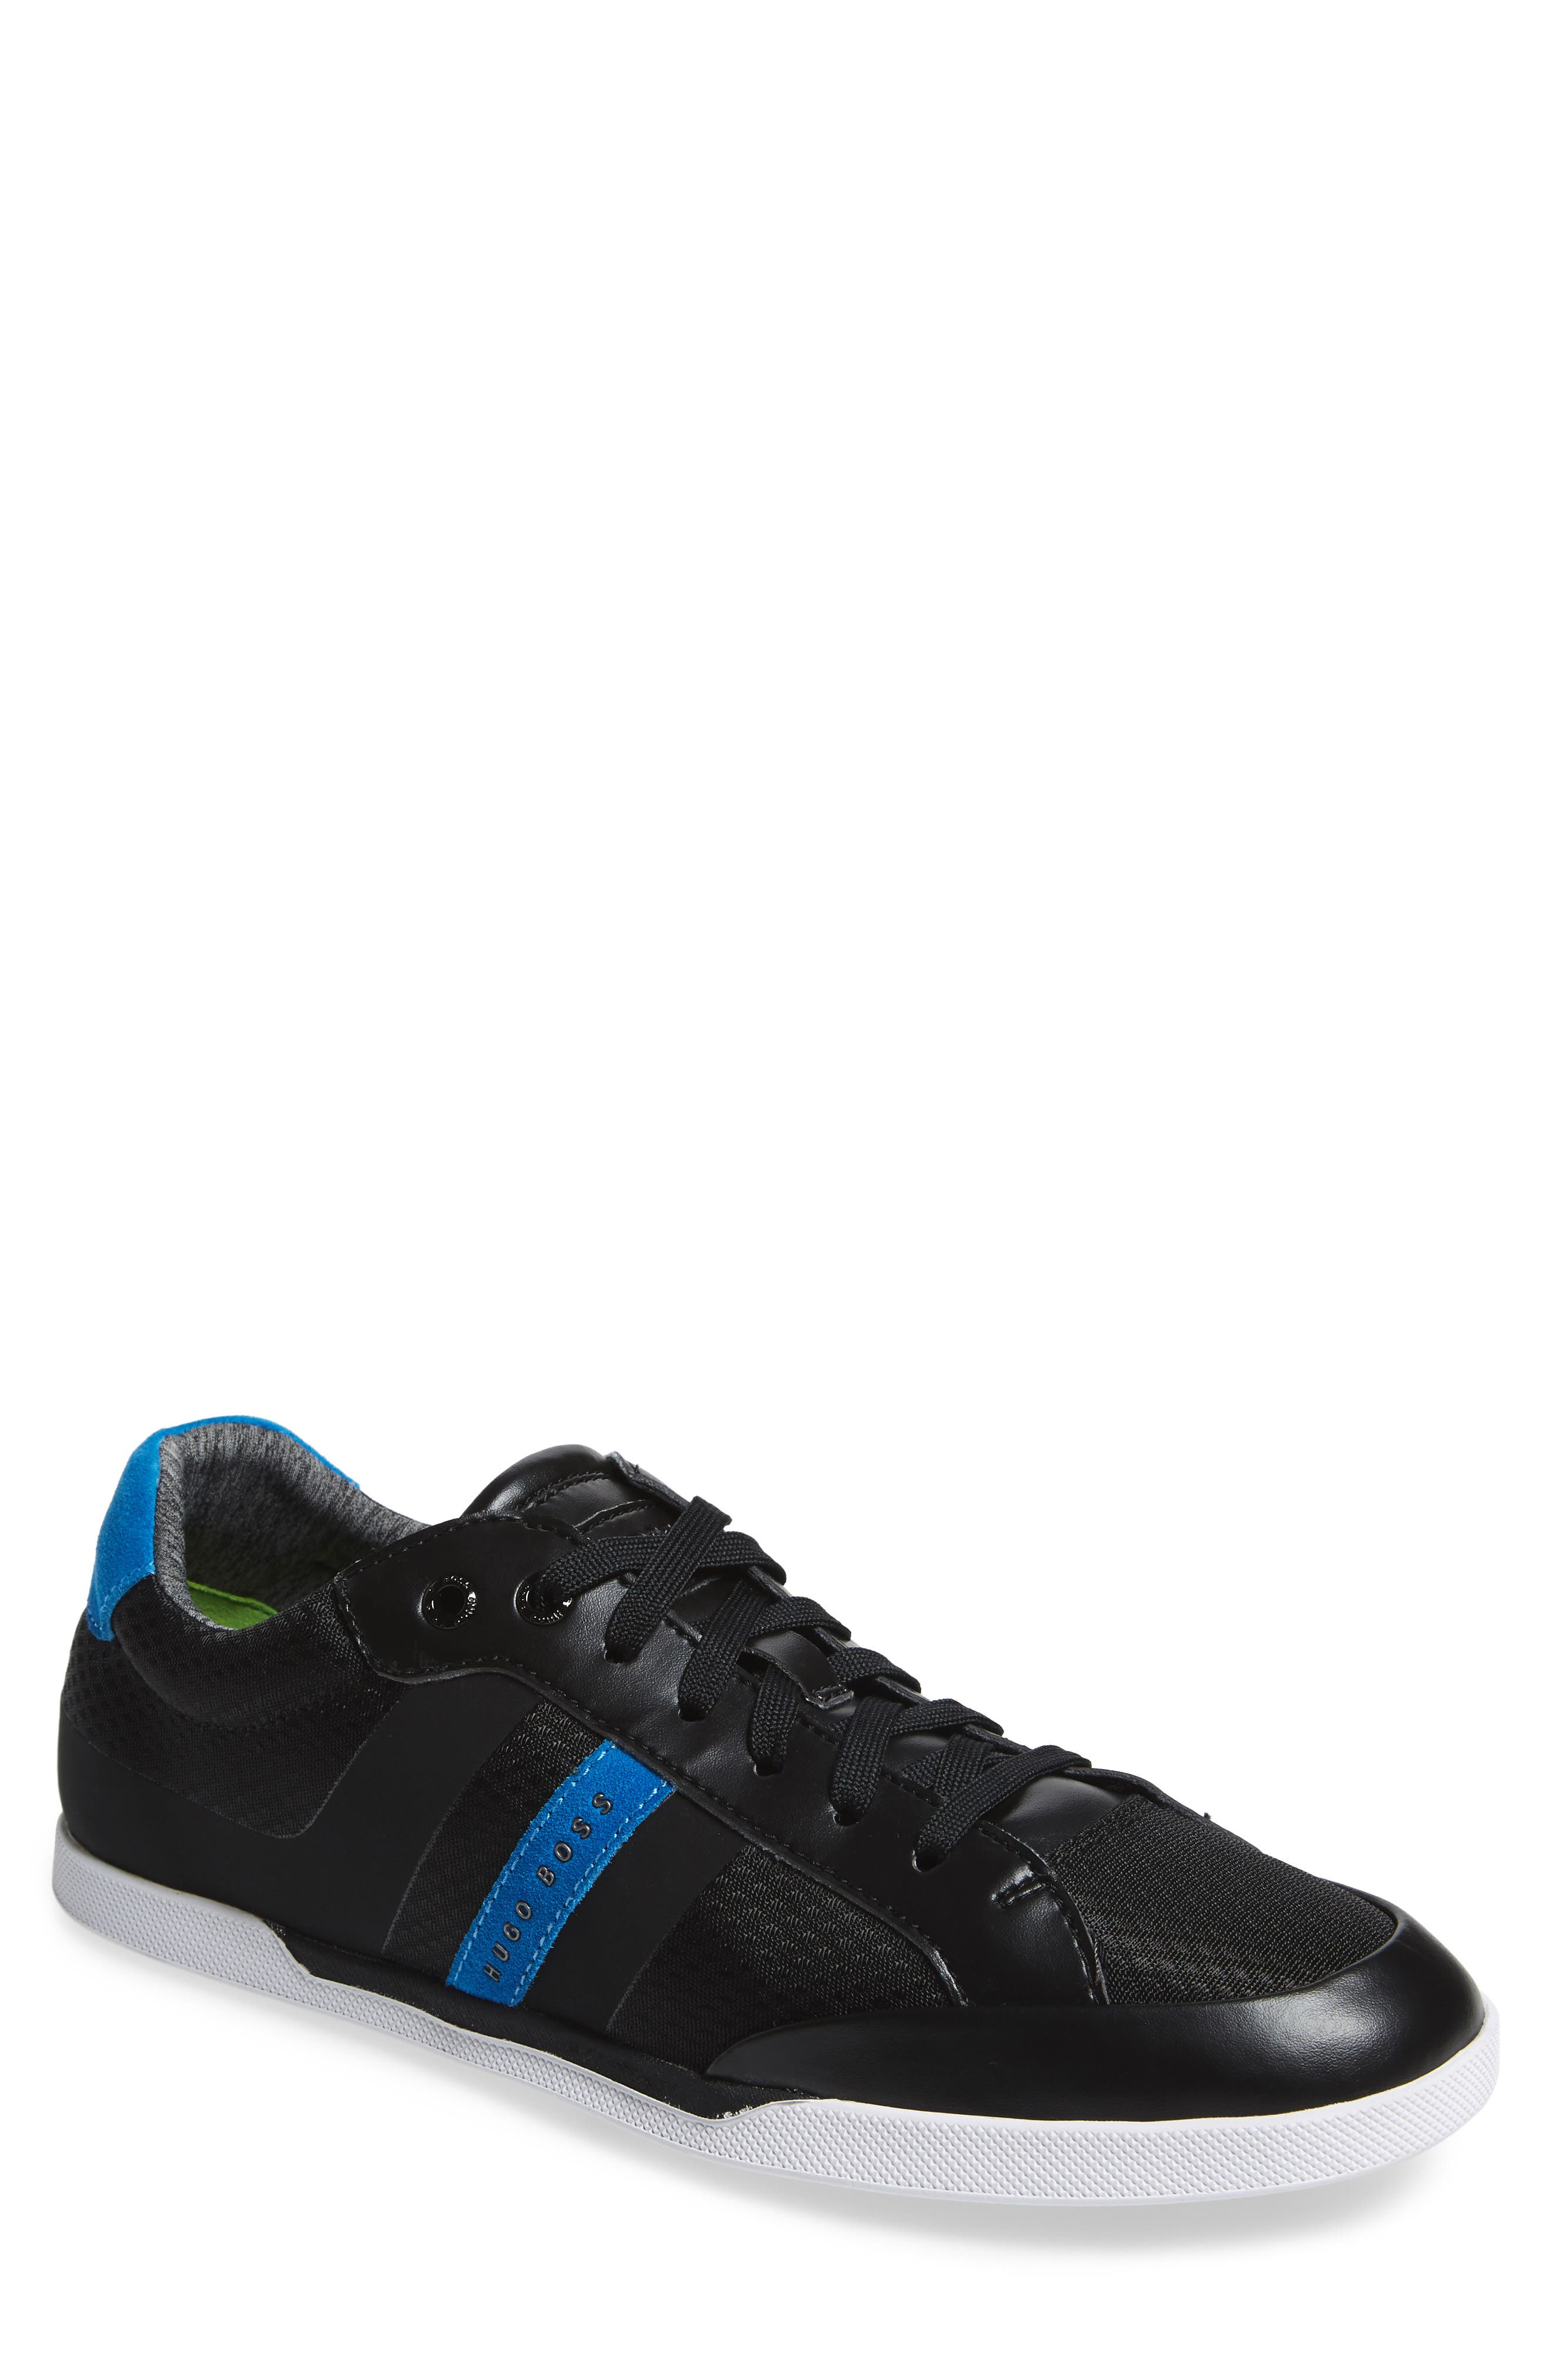 Shuttle Sneaker,                             Main thumbnail 1, color,                             BLACK